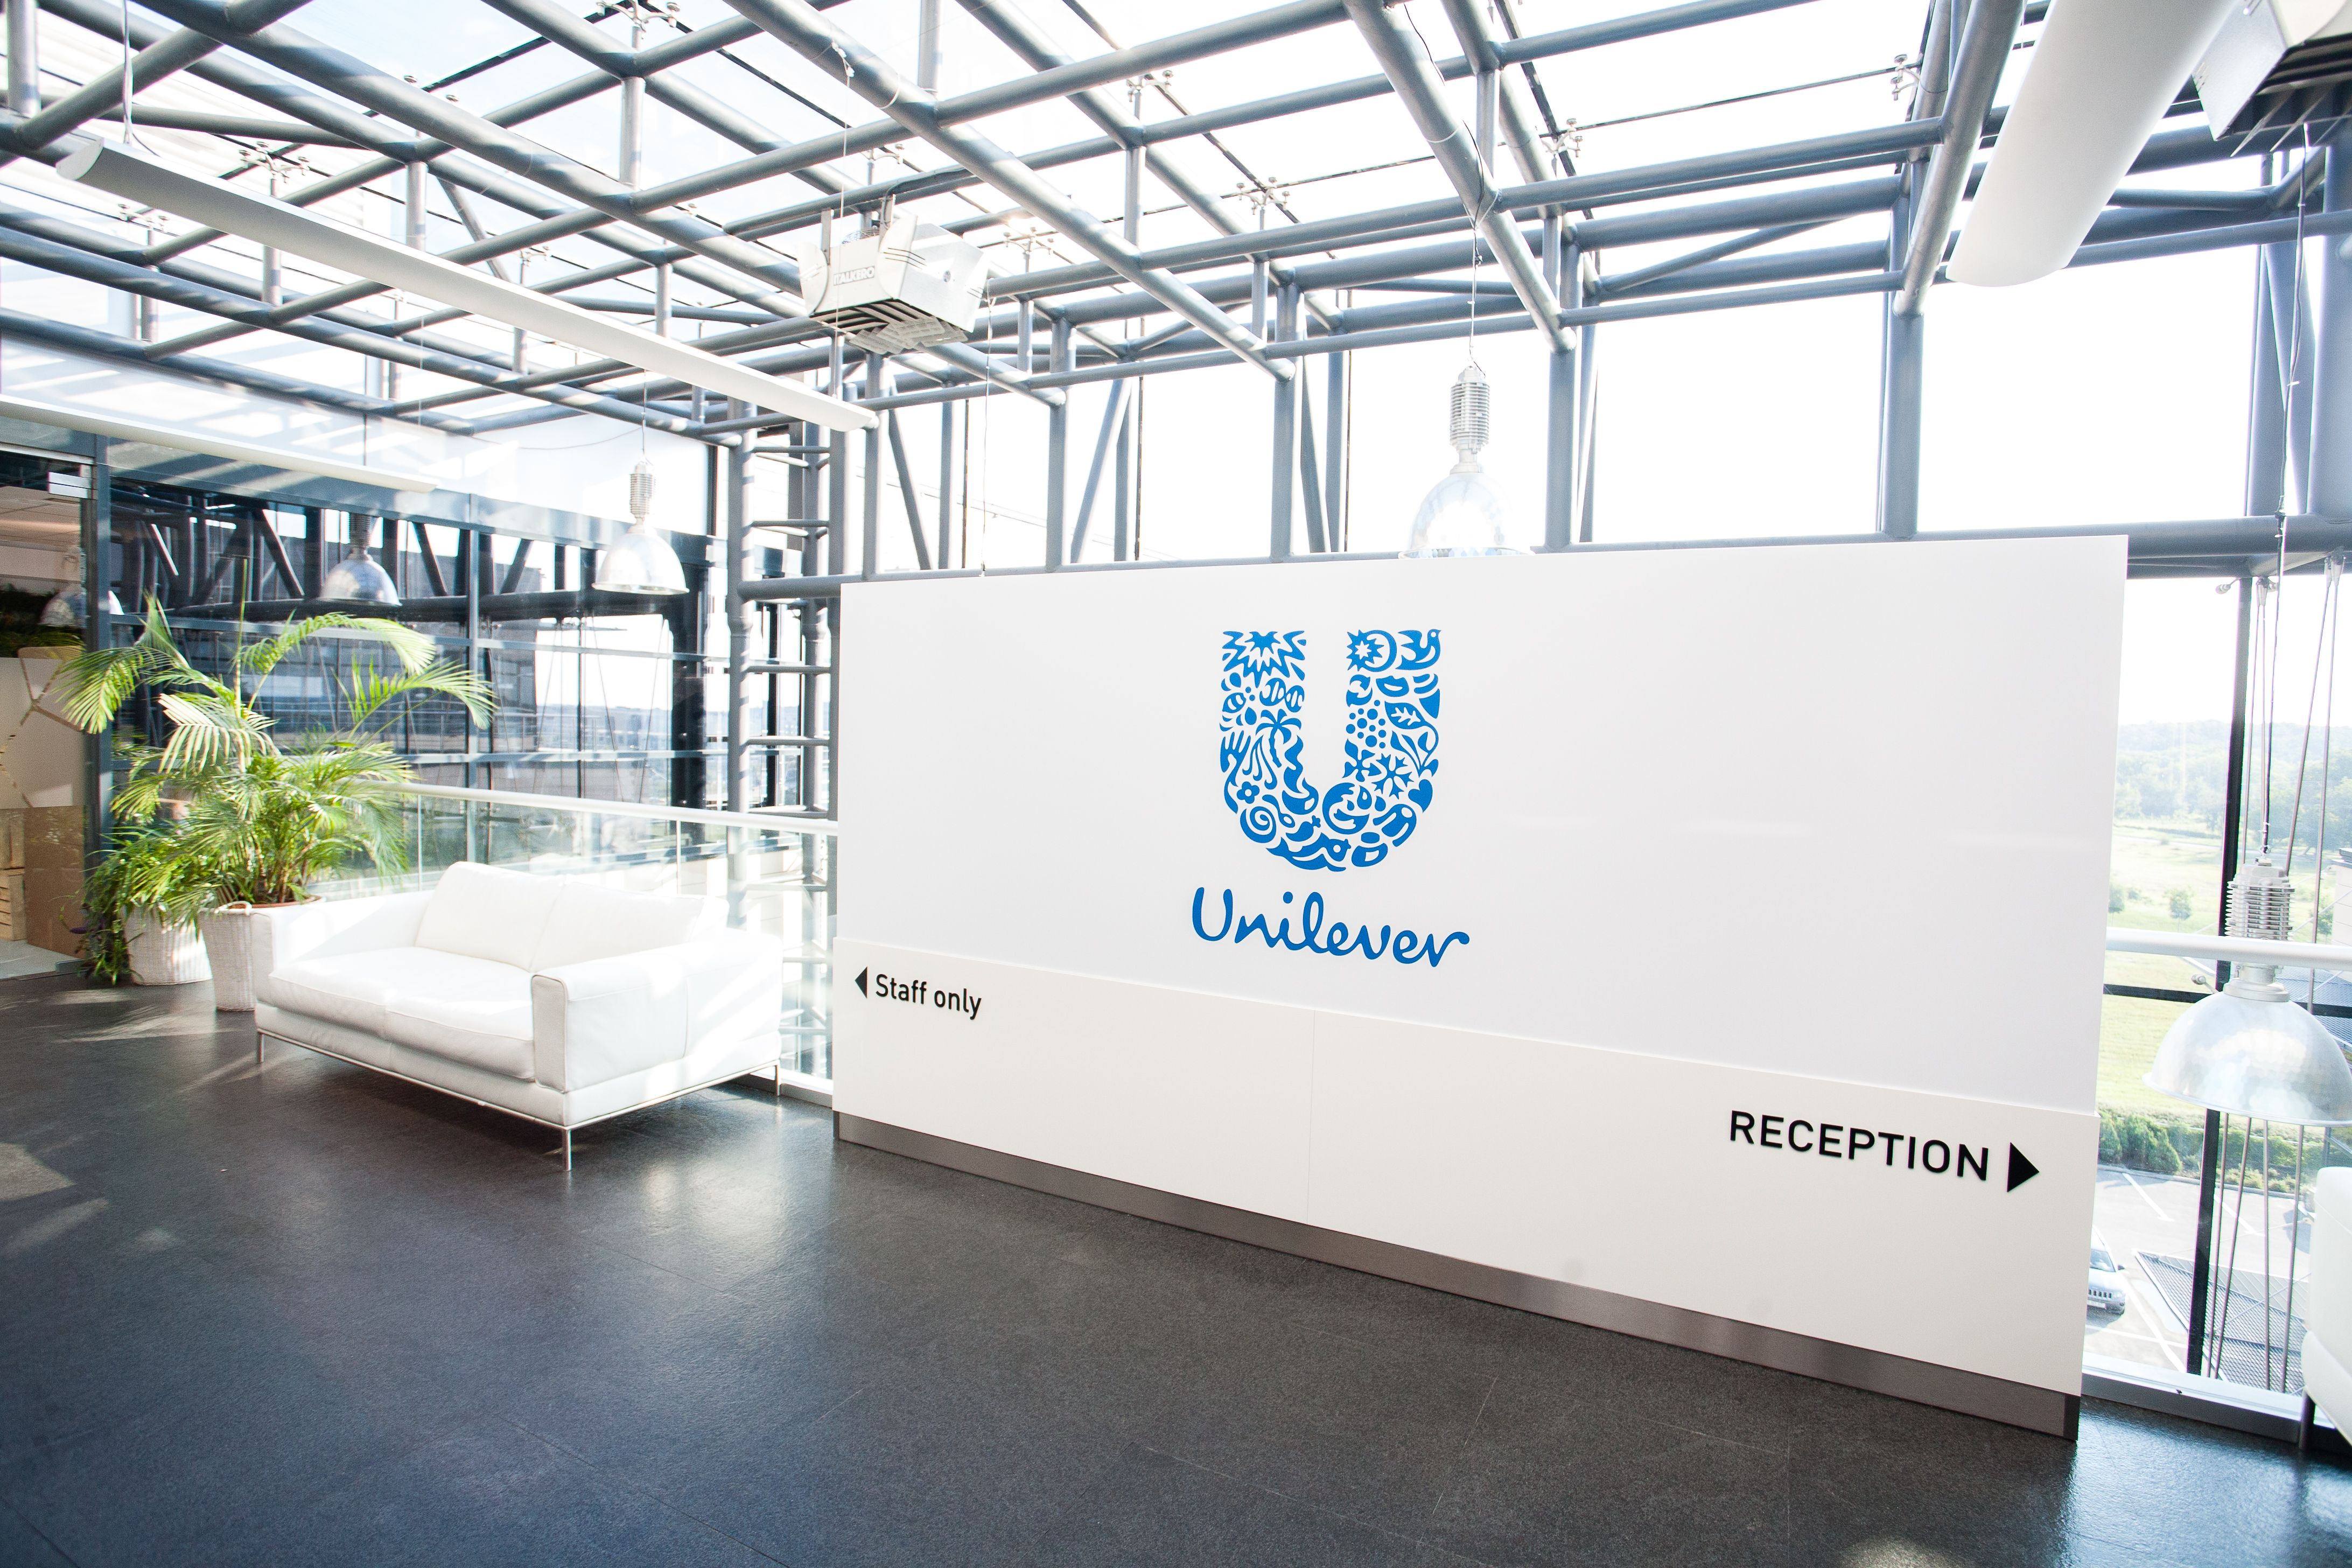 unilever office. Reception Unilever Office Interior Design Bucharest